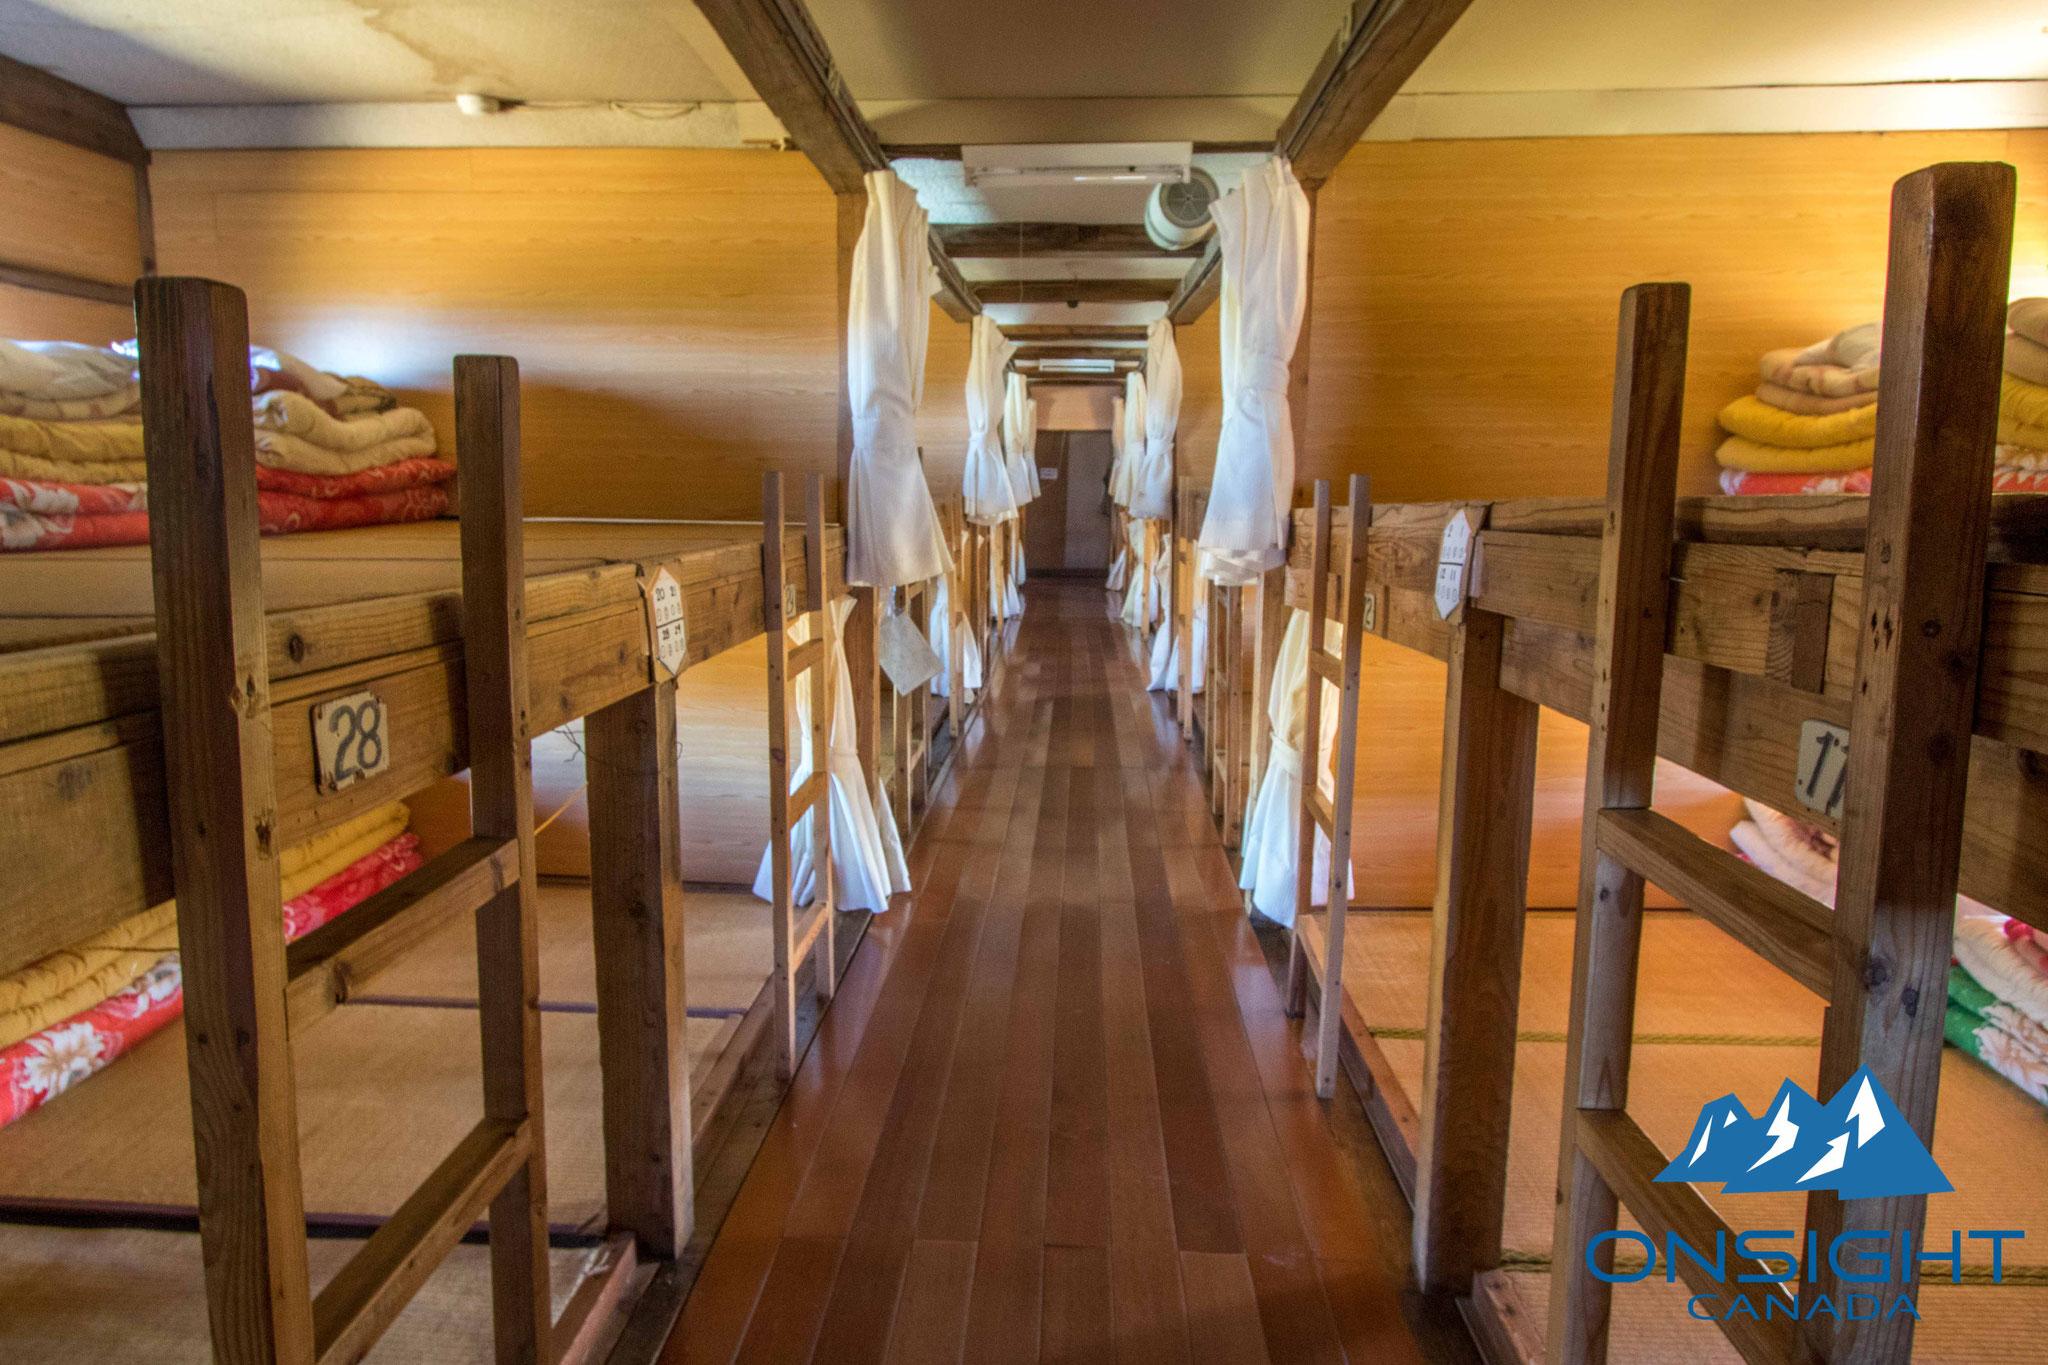 Sleeping in bunk bed